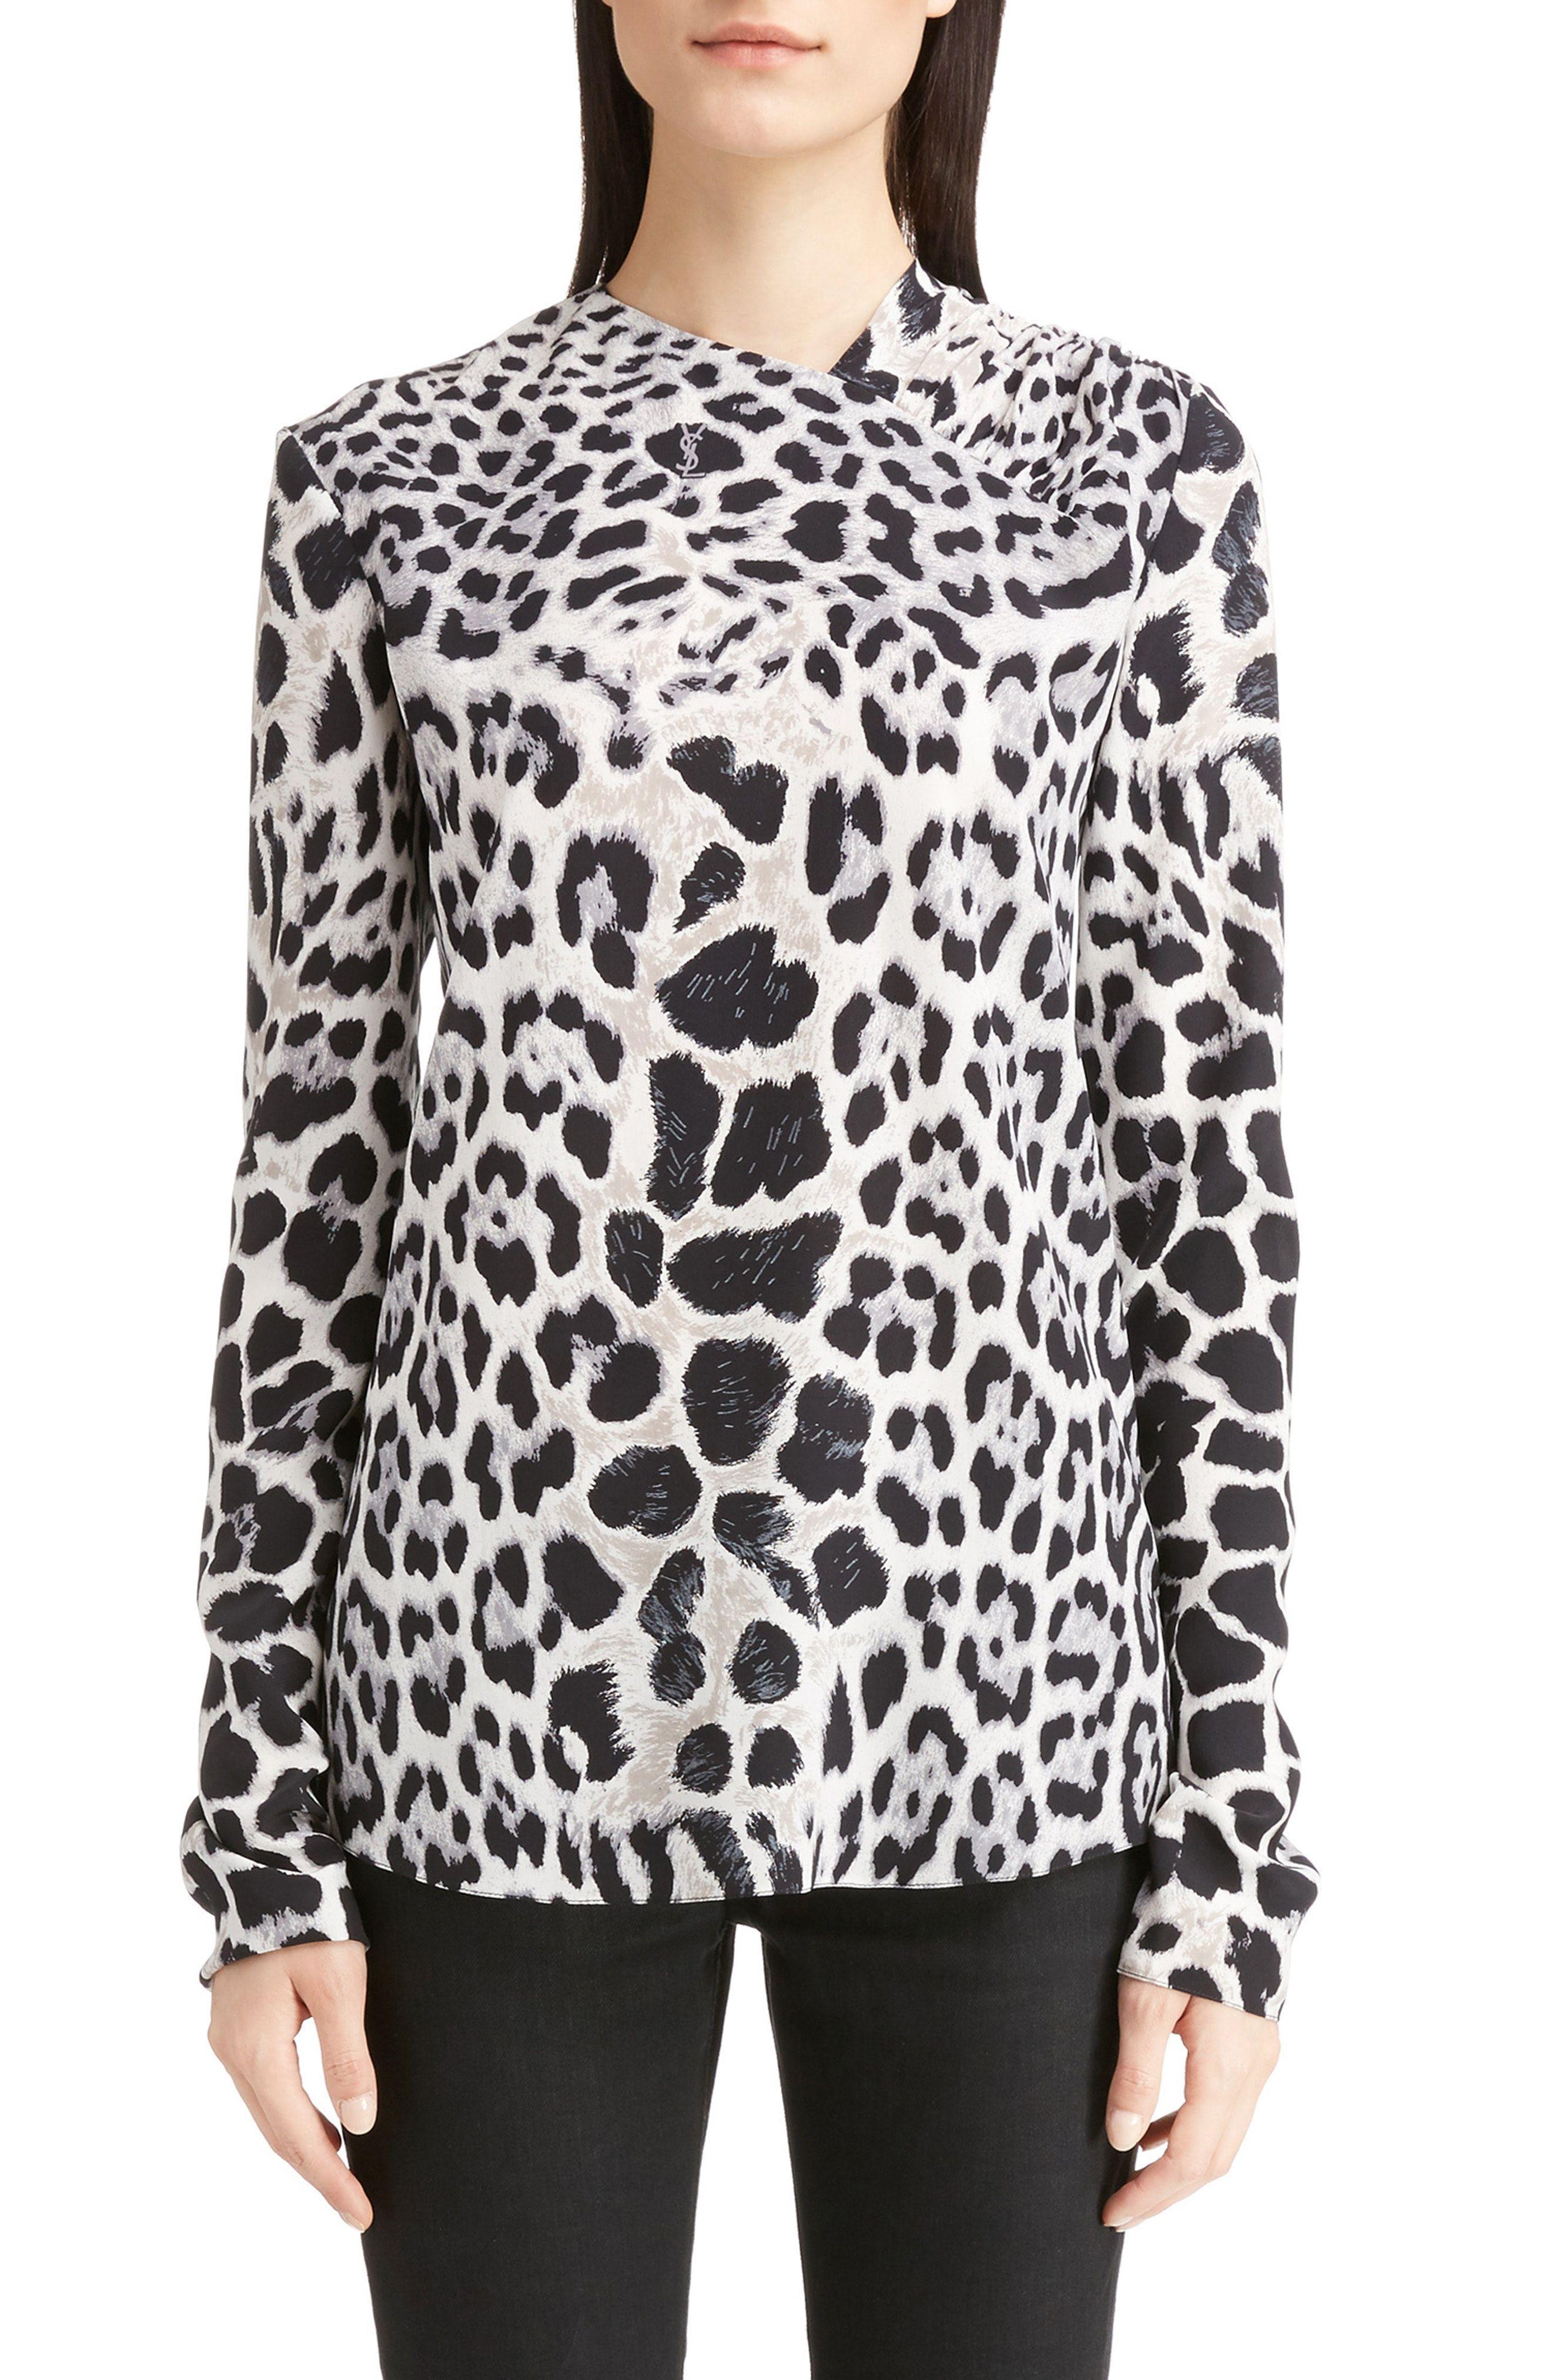 41ce94ca2131b5 New Saint Laurent Logo Leopard Print Silk Crepe de Chine Blouse APRICOT  fashion online.   1990  new offer from topshoppingonline